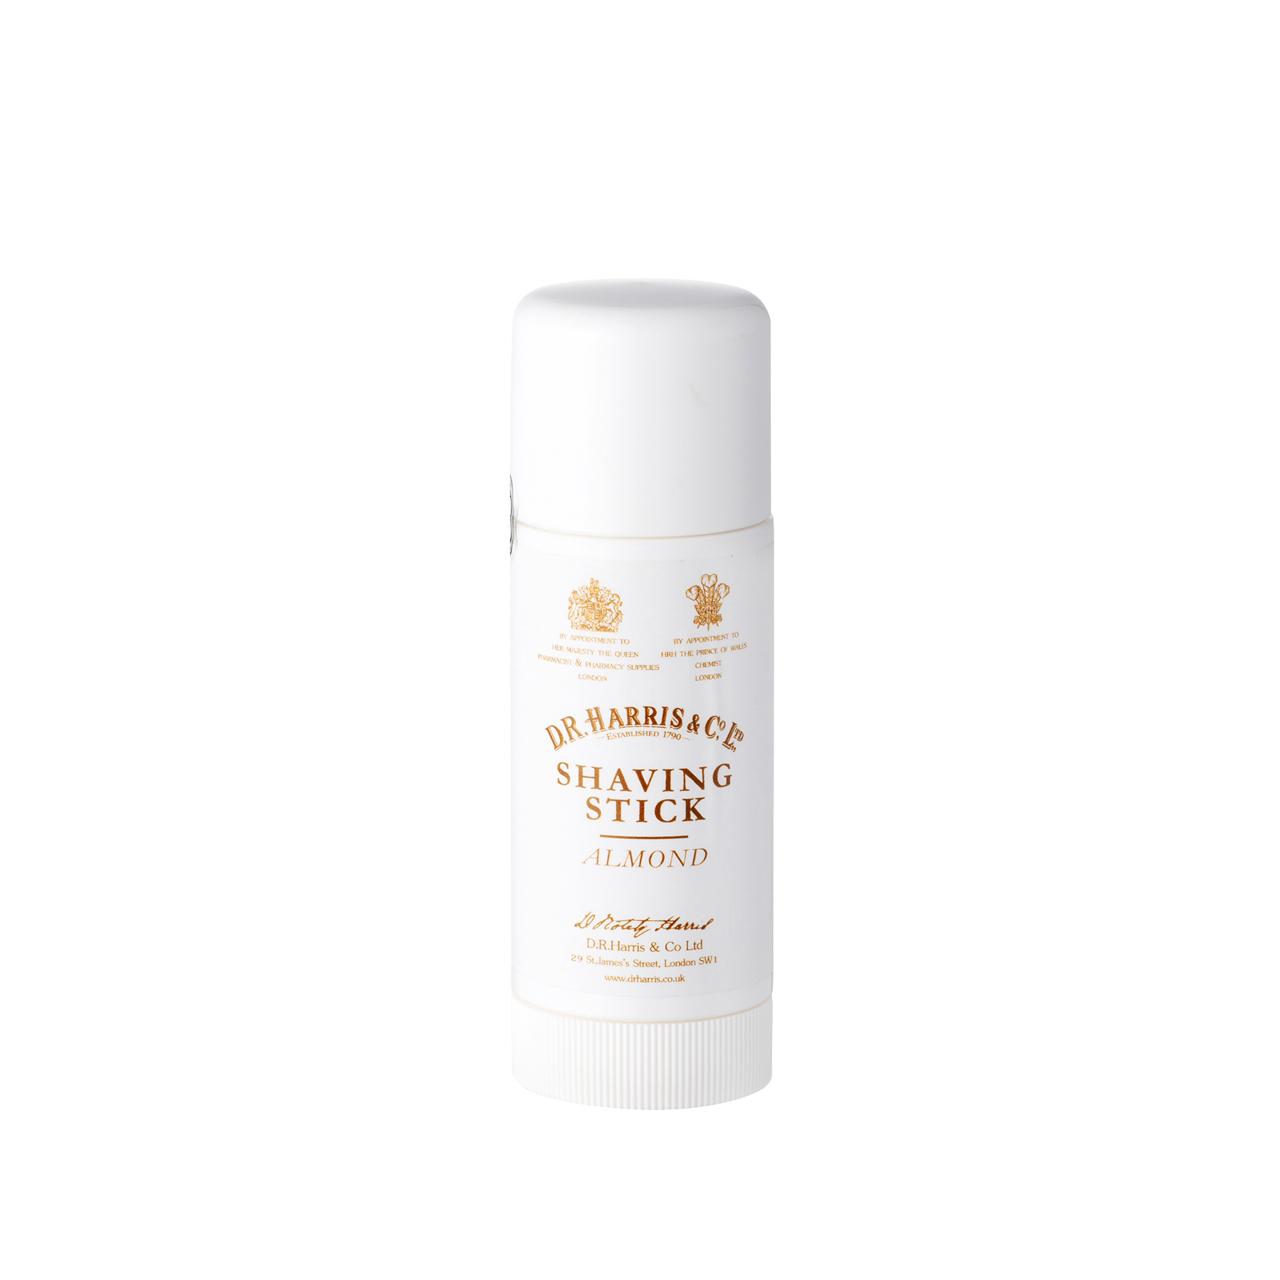 Almond - Shaving Soap Stick